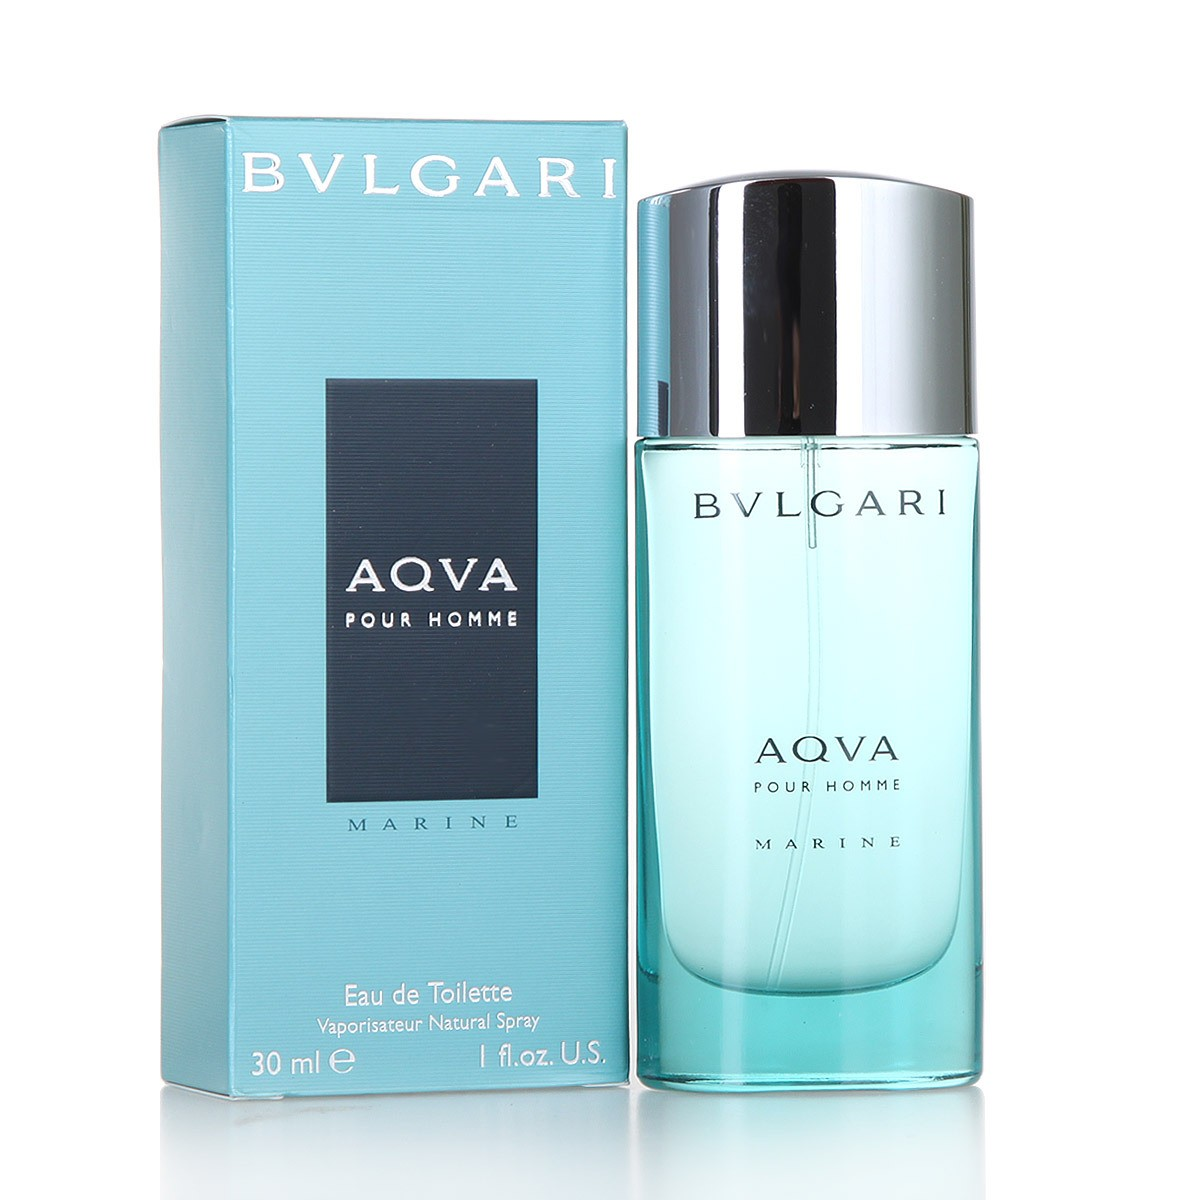 Bvlgari Aqva pour Homme Marine, Toaletní voda, 30ml, Pánska vôňa, + AKCE: dárek zdarma